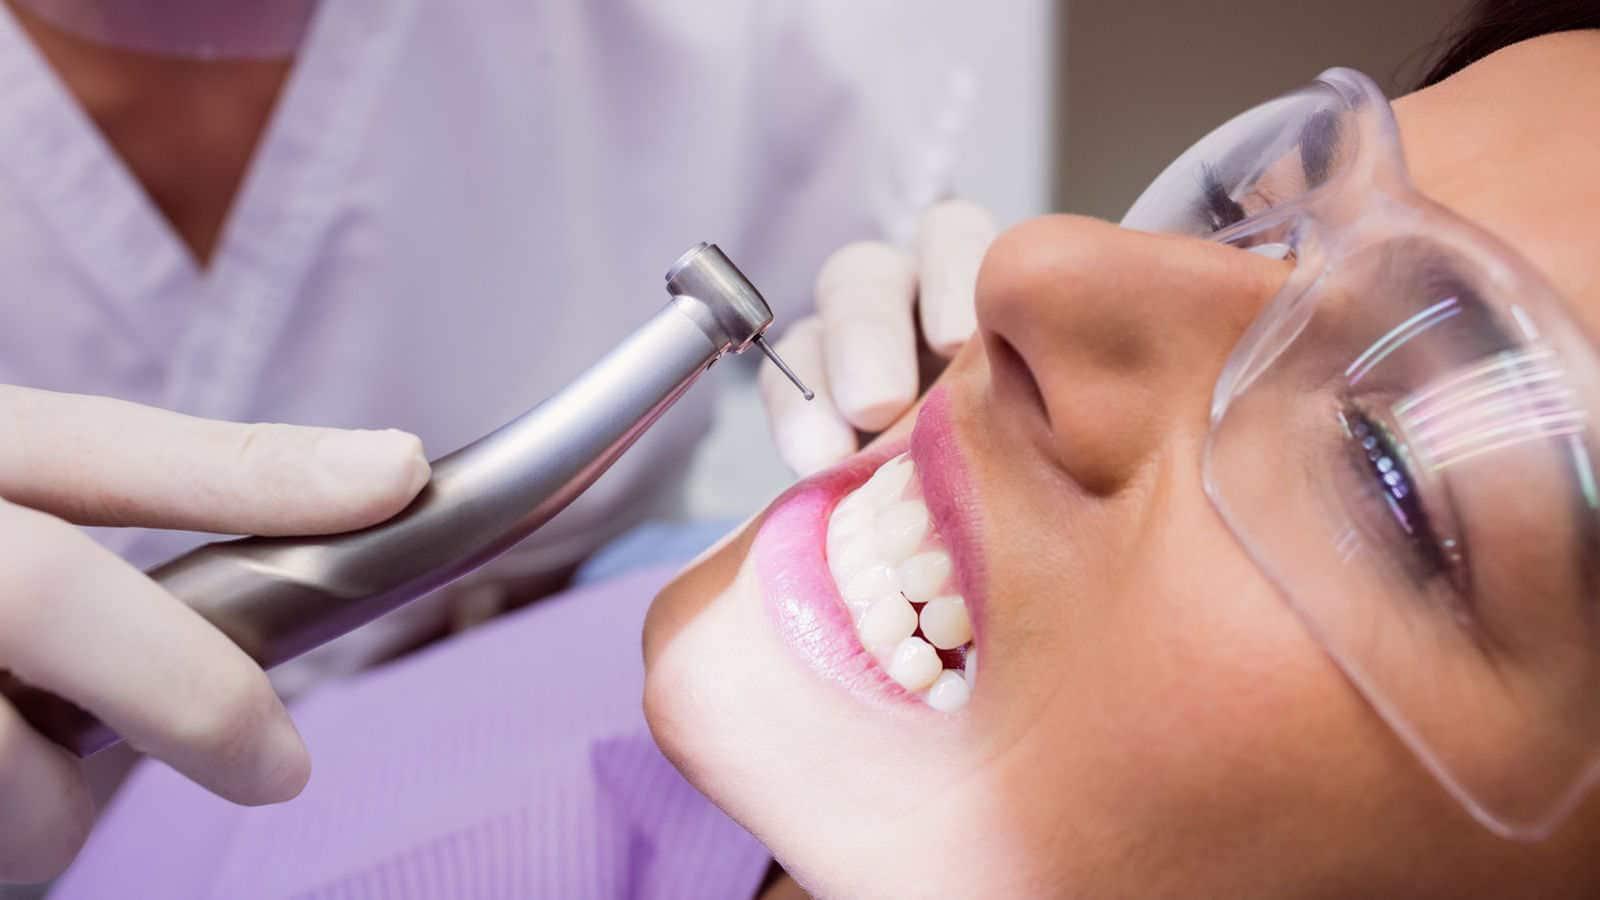 All Care Dental of Fremont